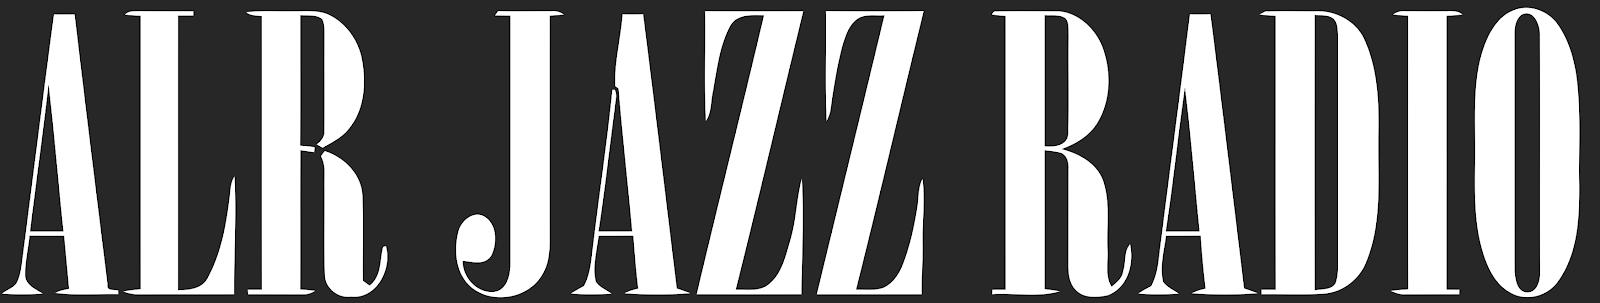 Jazz | ALR Jazz Radio | Official Site